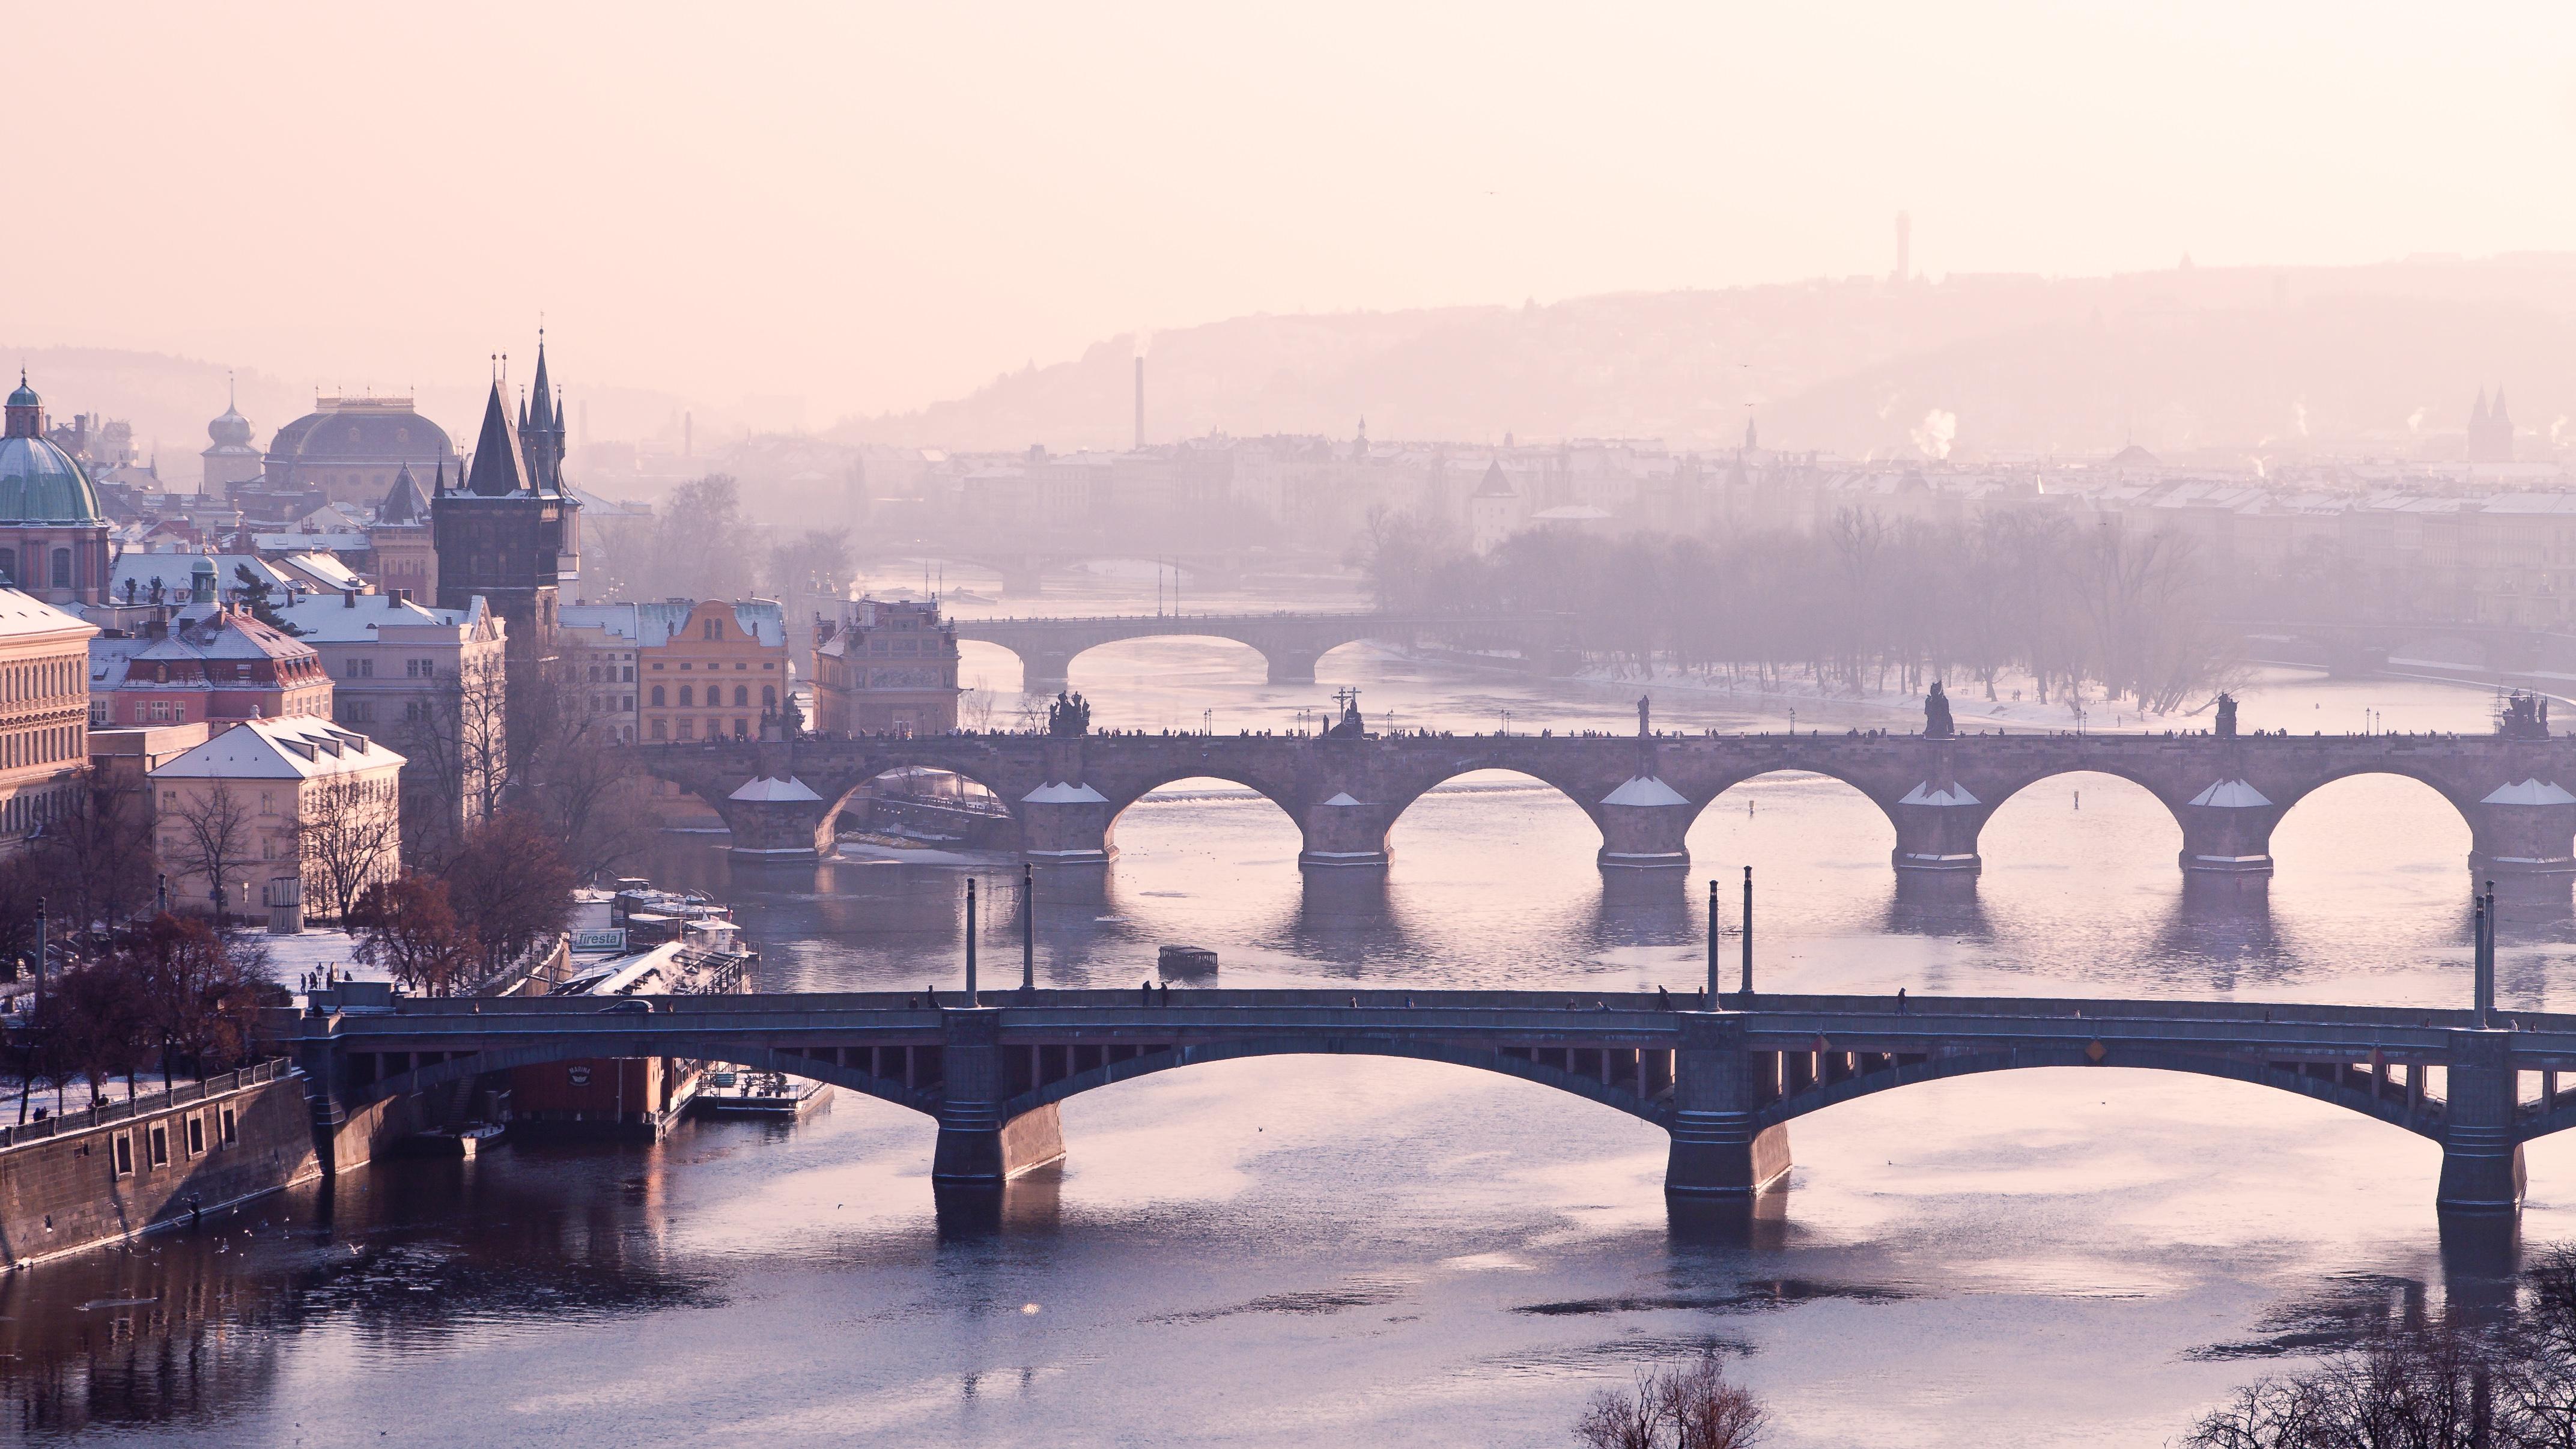 Прага по стопам вельмож и знати